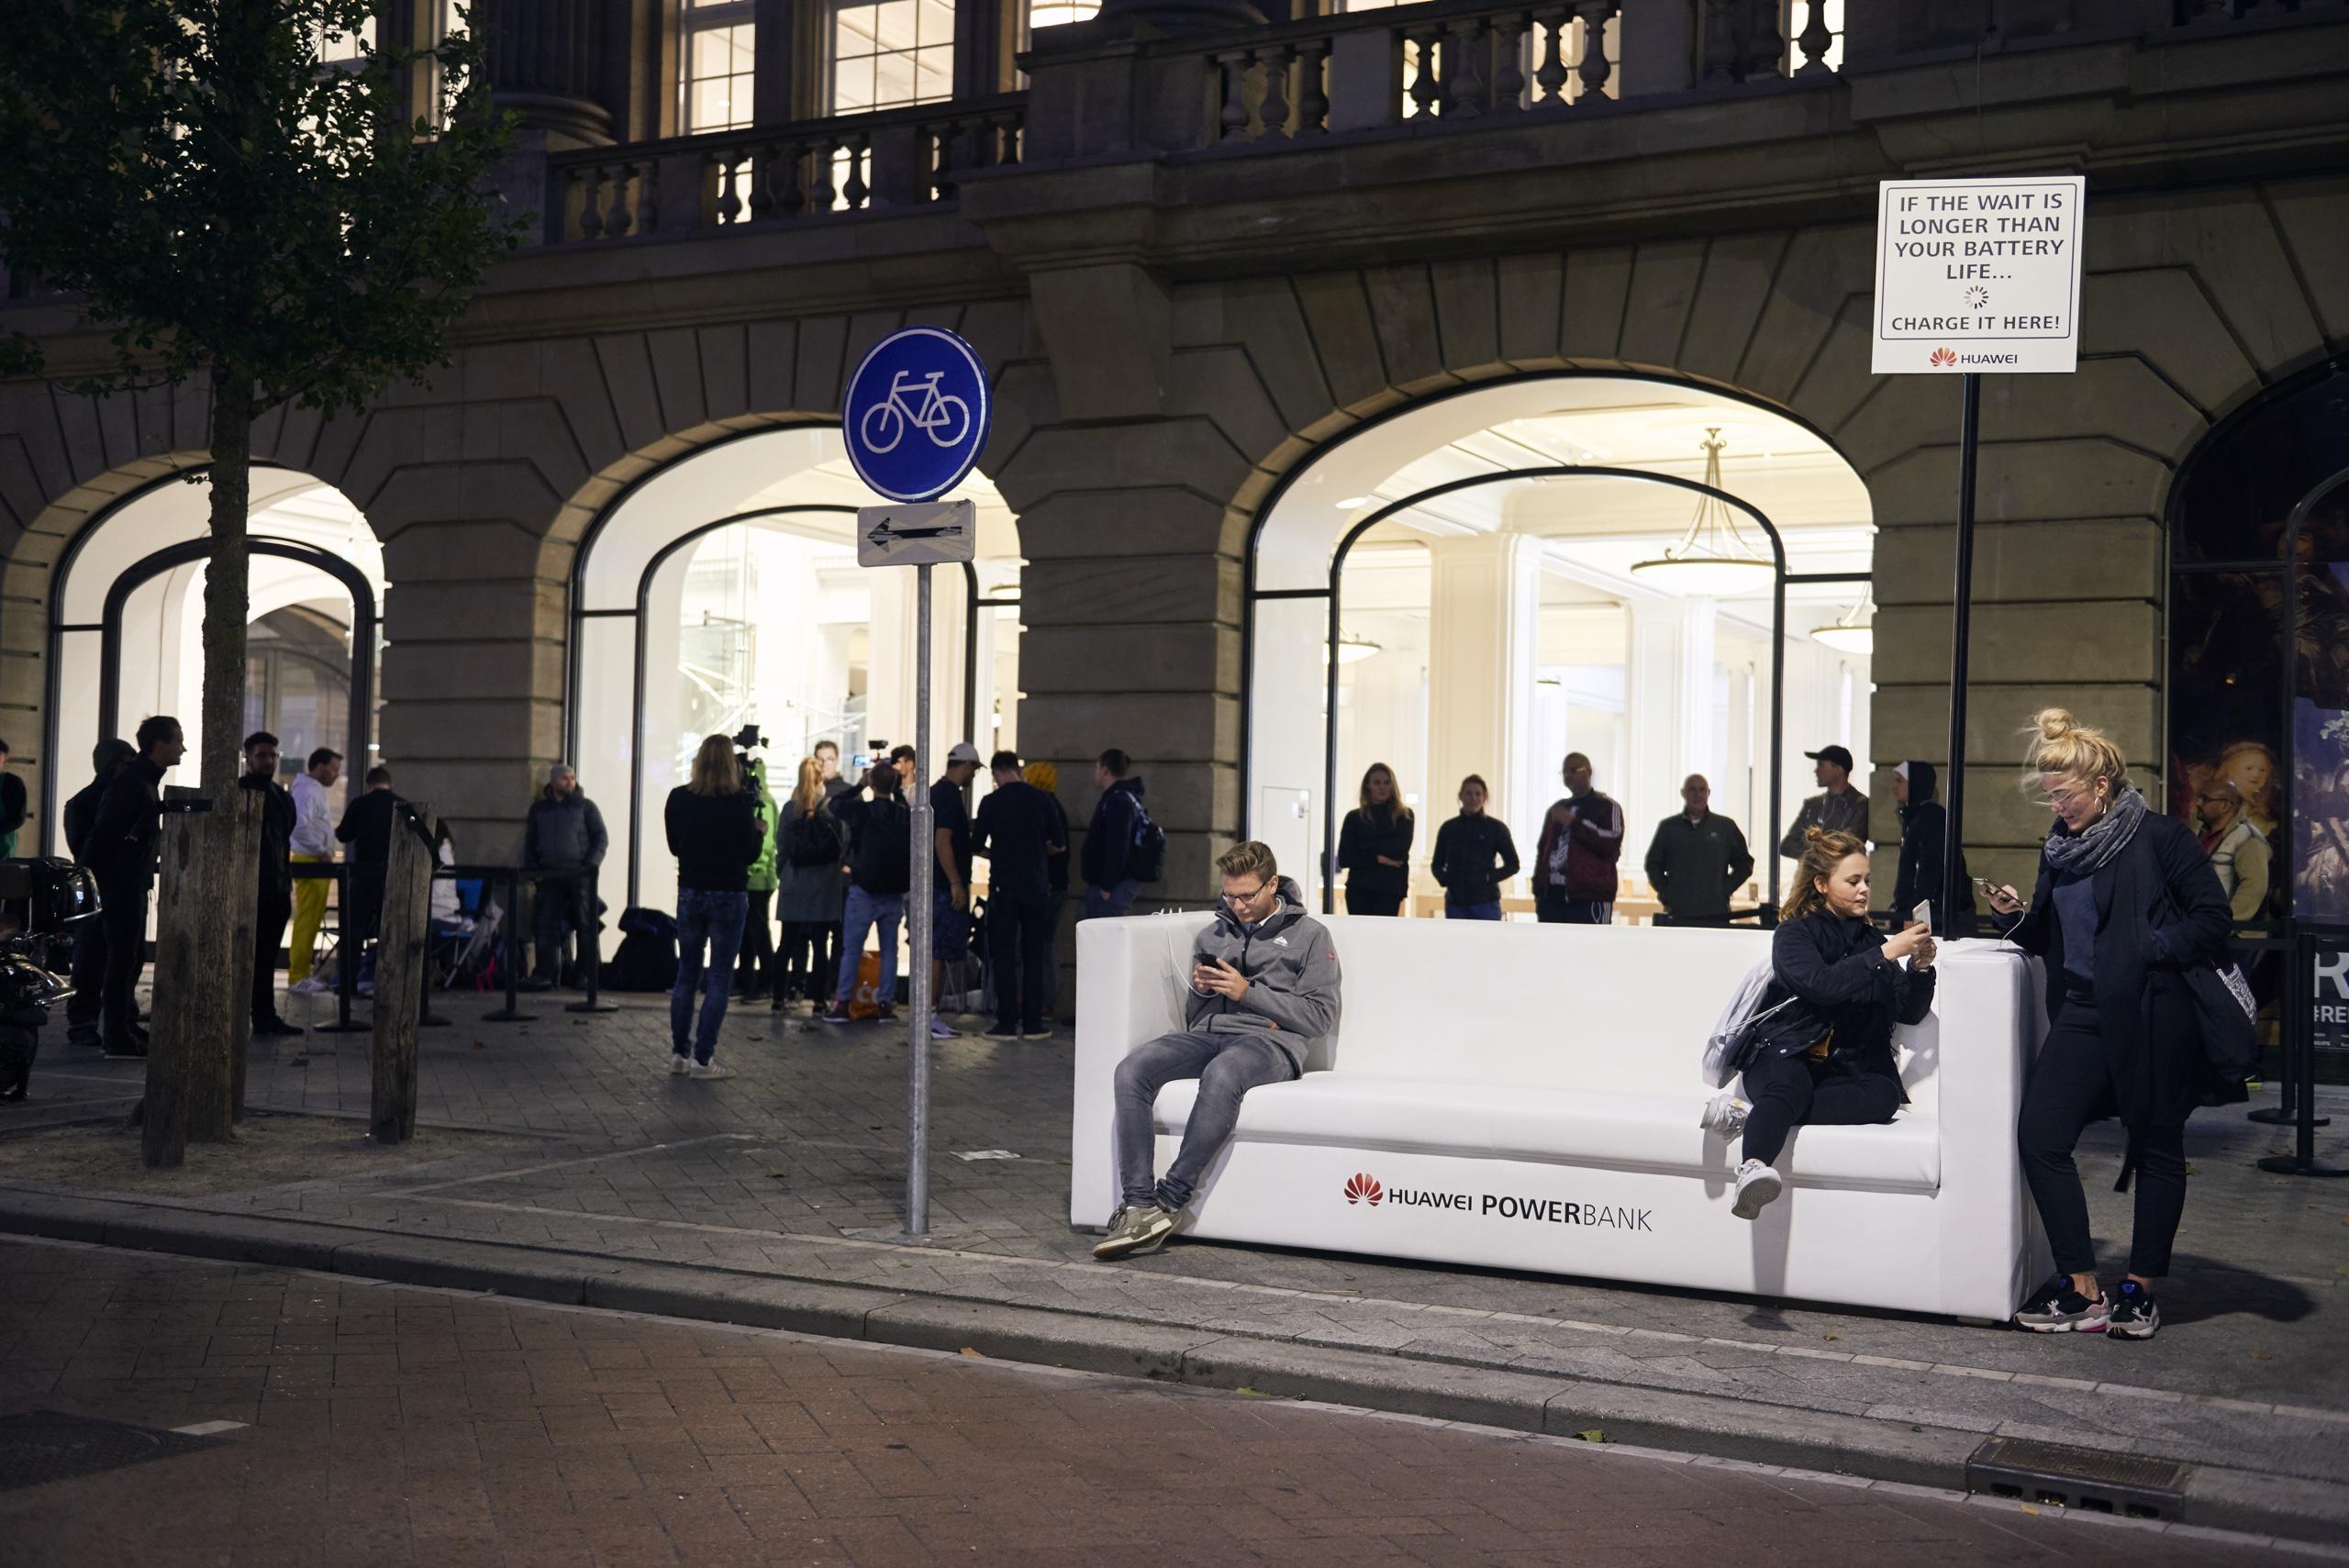 Huawei Powerbank iPhone Xs Apple Store Amsterdam Leidseplein